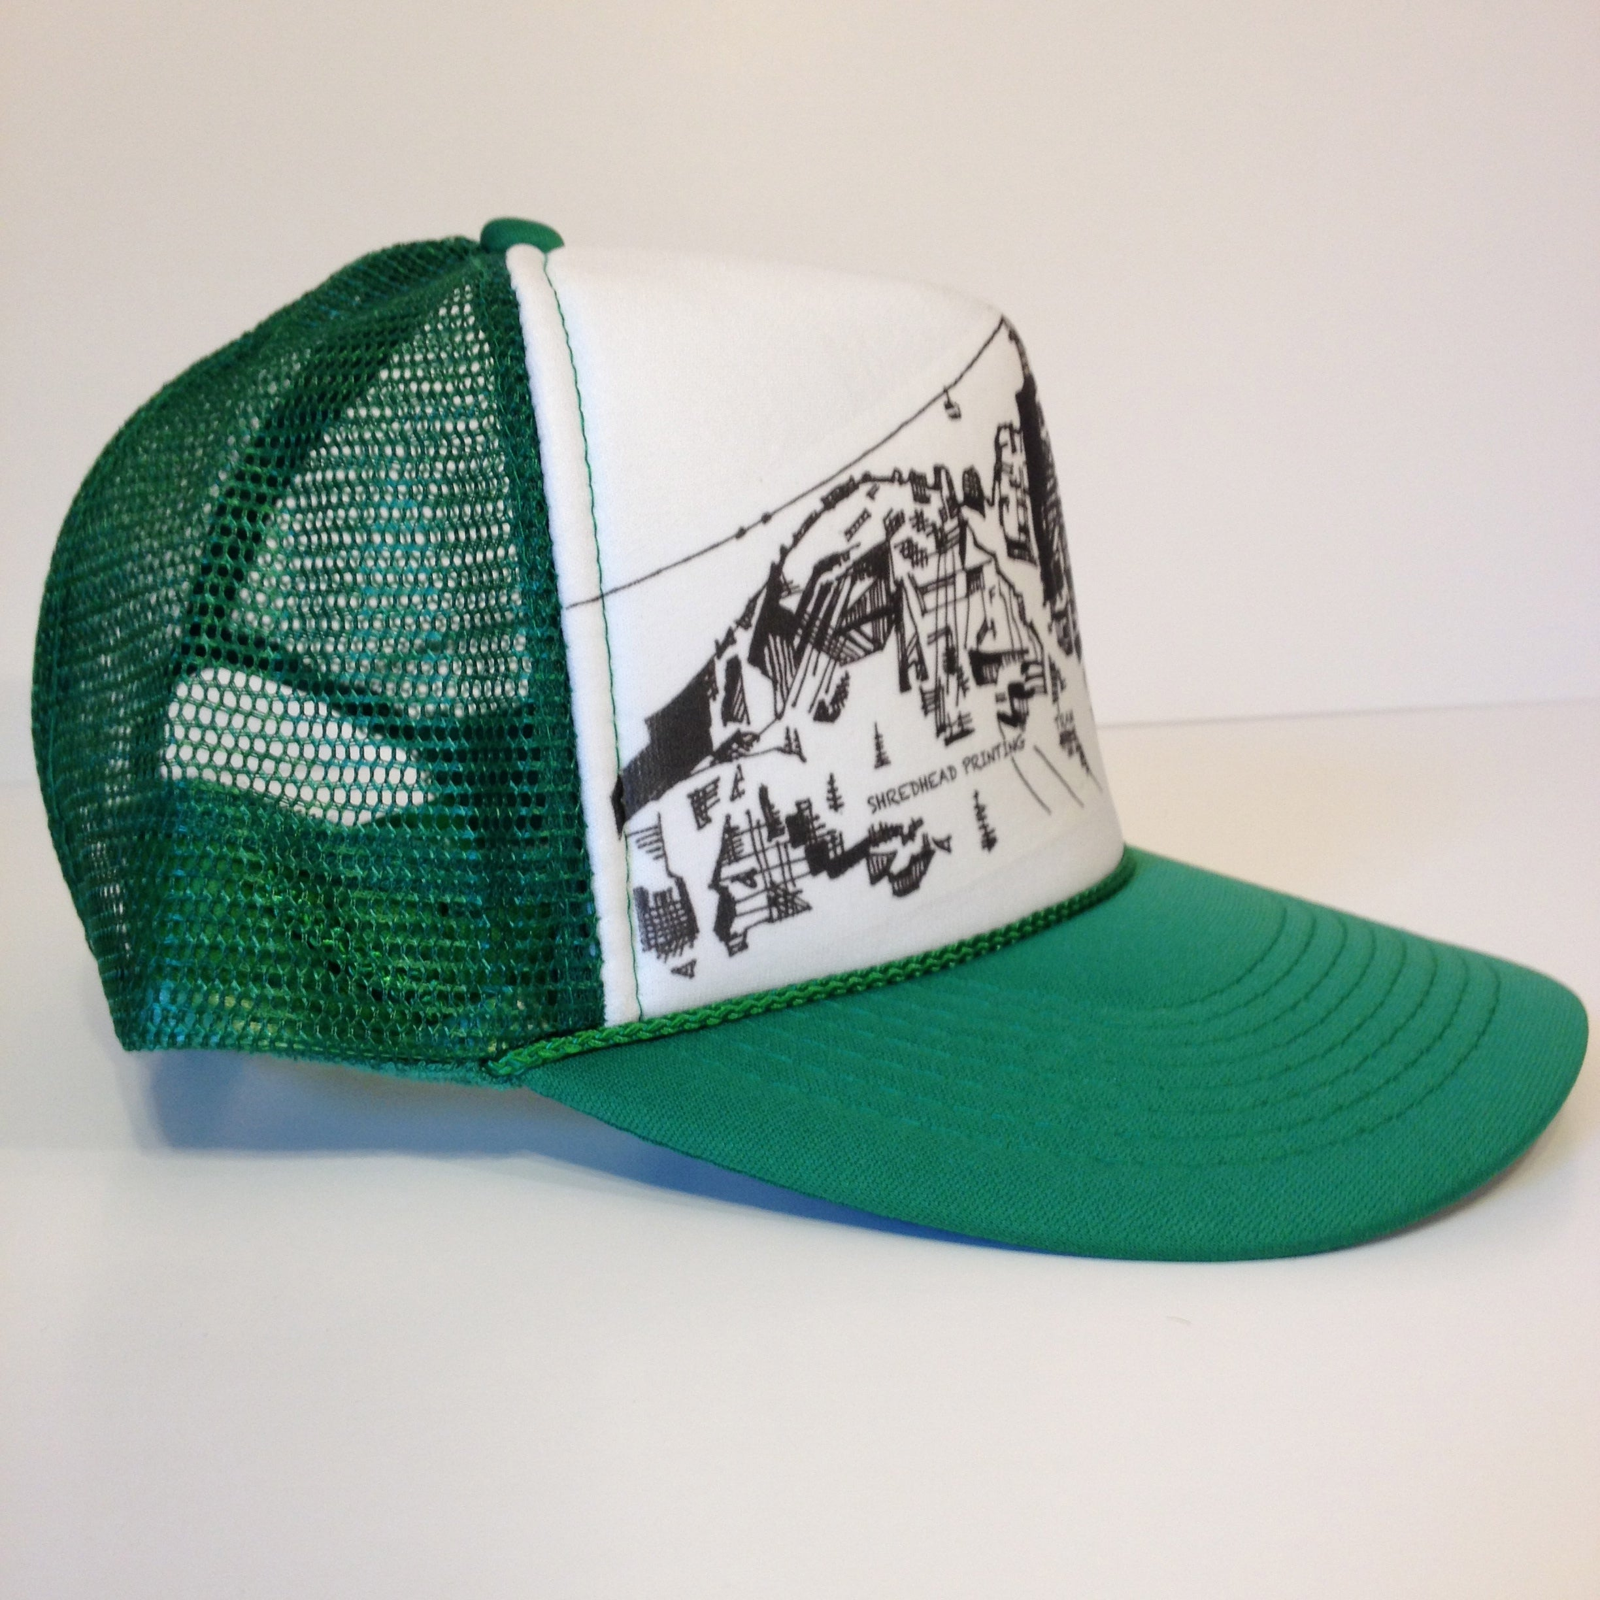 Tram trucker hat shredhead printing jpg 1000x1000 Shred head hat bb4ff1c194a6